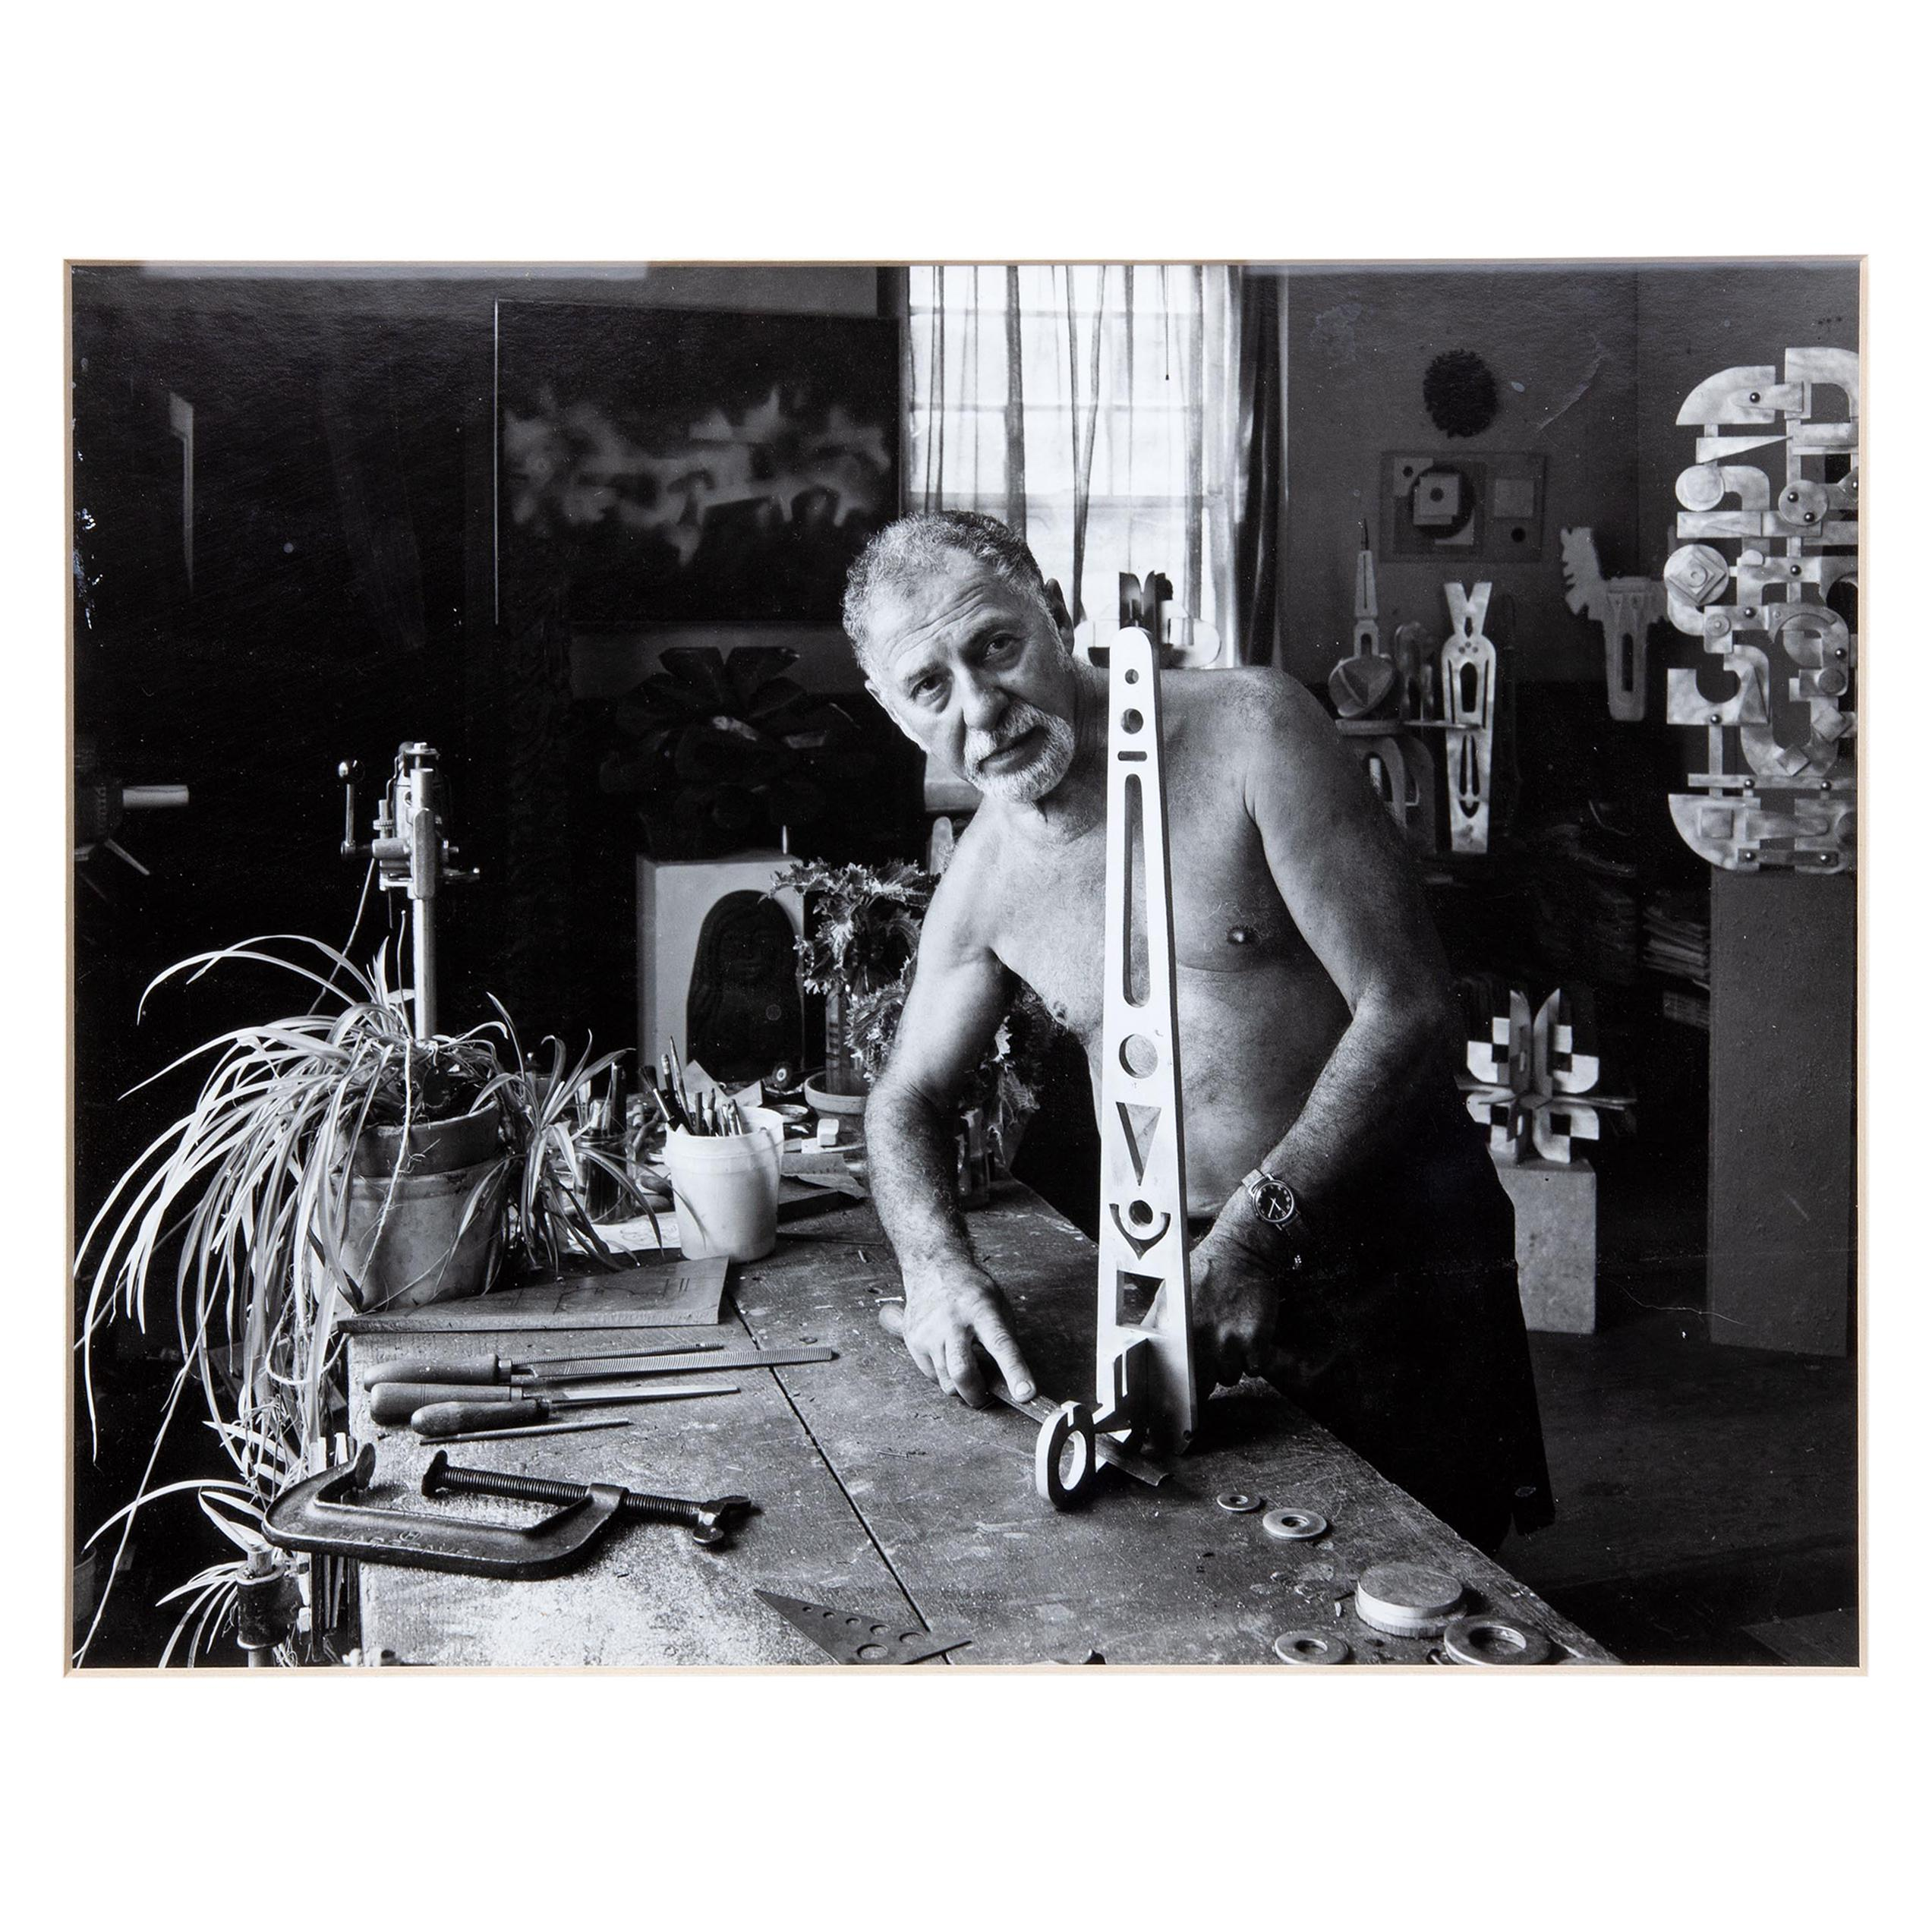 Vintage Photograph of a Modern Sculptor